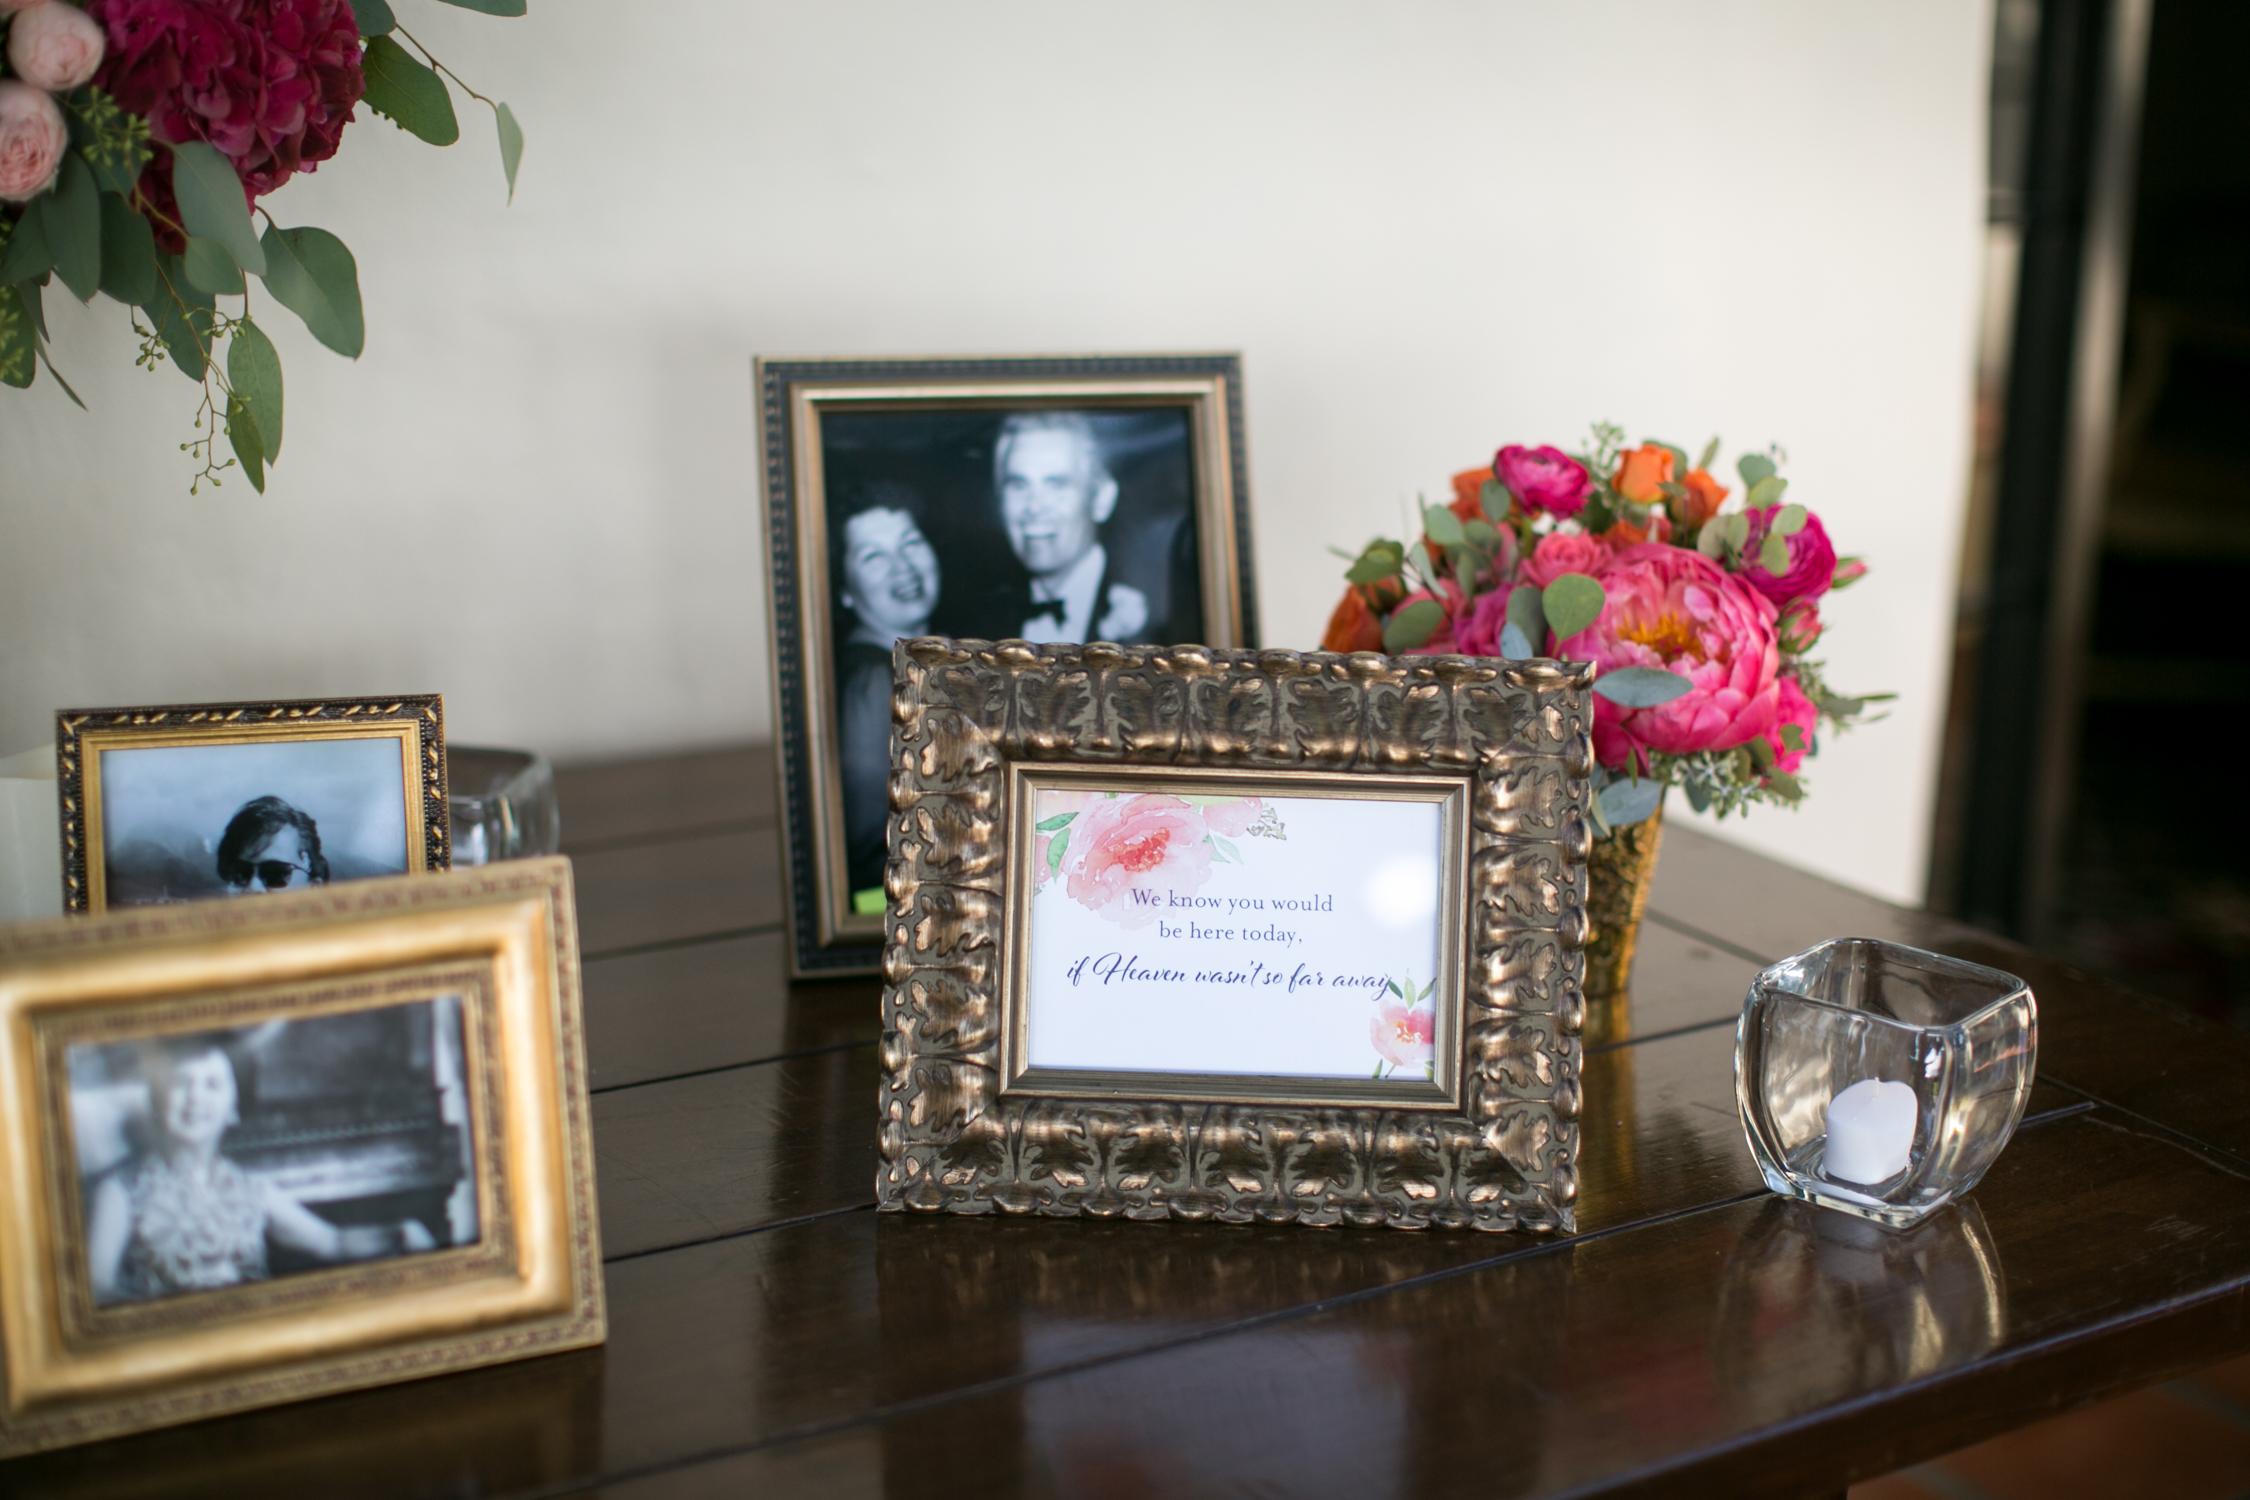 www.santabarbarawedding.com | Miki & Sonja Photography | Four Seasons Resort The Biltmore | Imagine Weddings & Special Events | Rockrose Floral Design | Memory Table